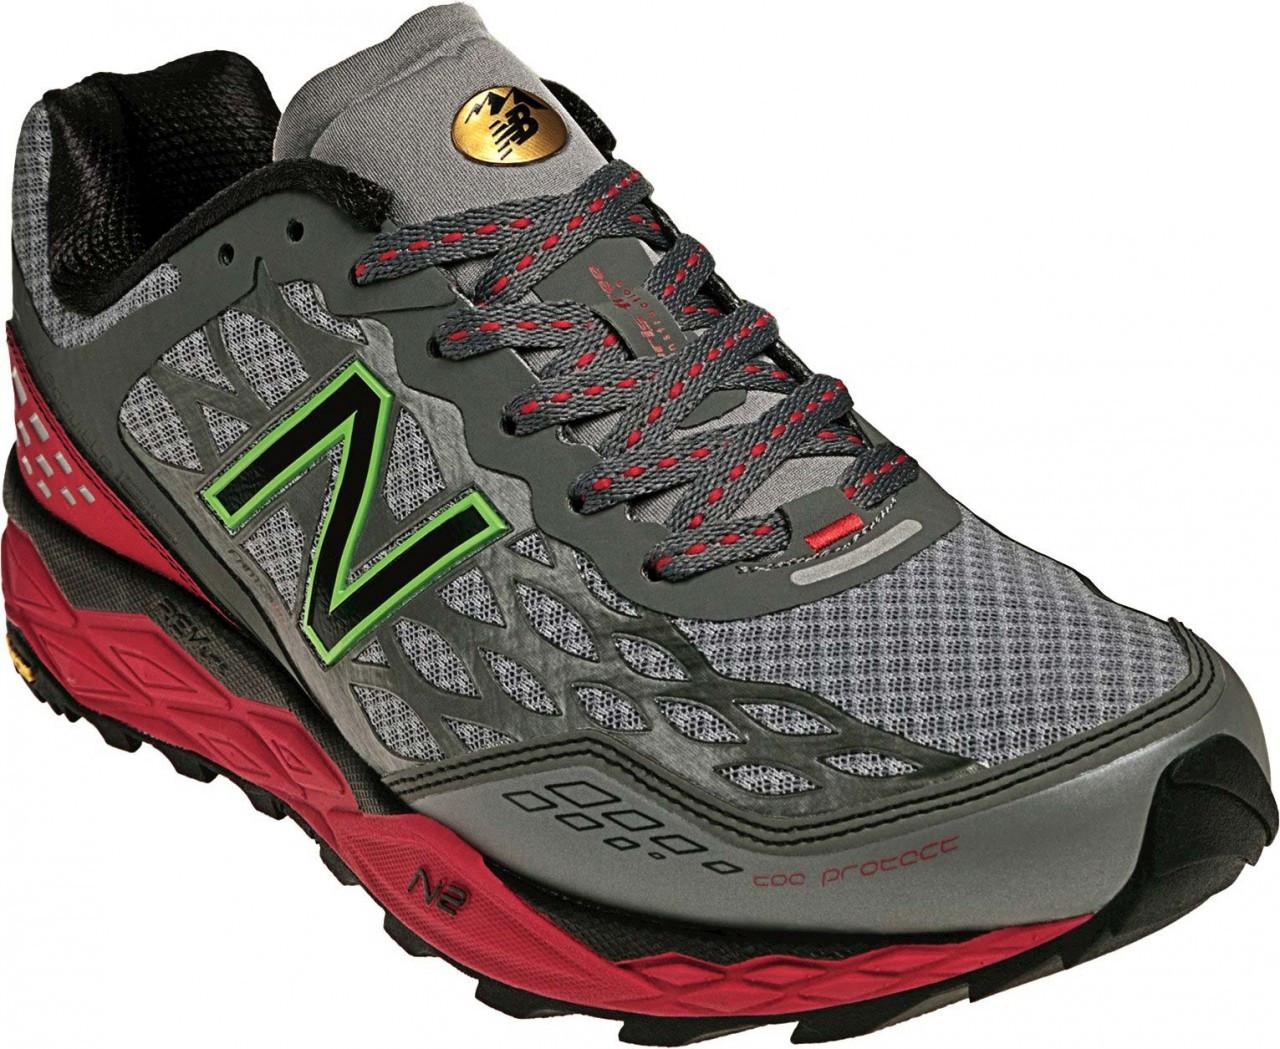 New Balance Running Shoes Thailand